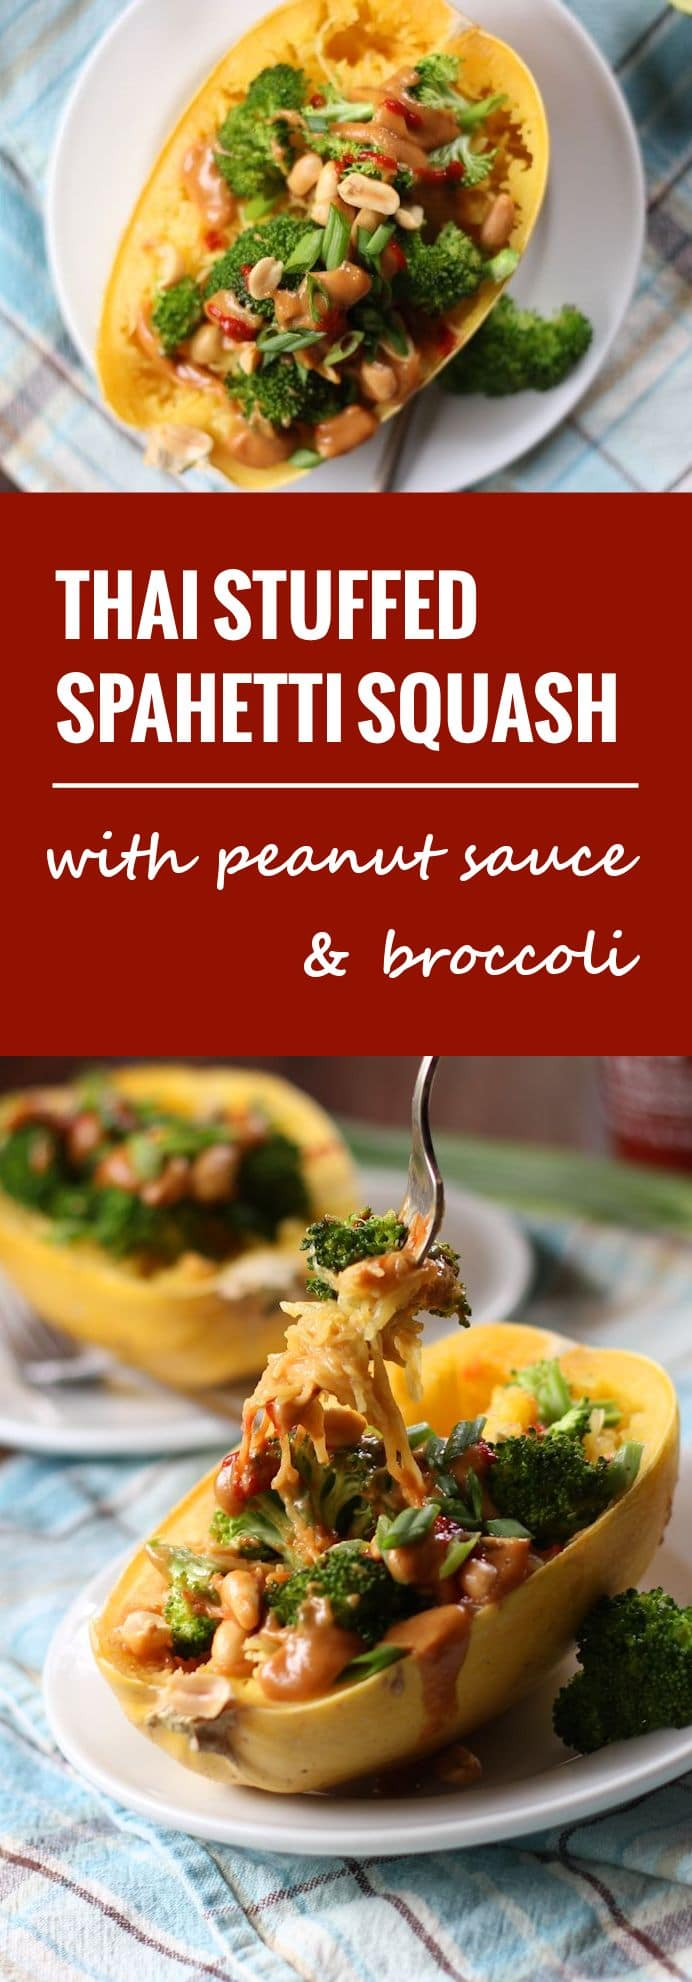 Thai Peanut & Broccoli Stuffed Spaghetti Squash